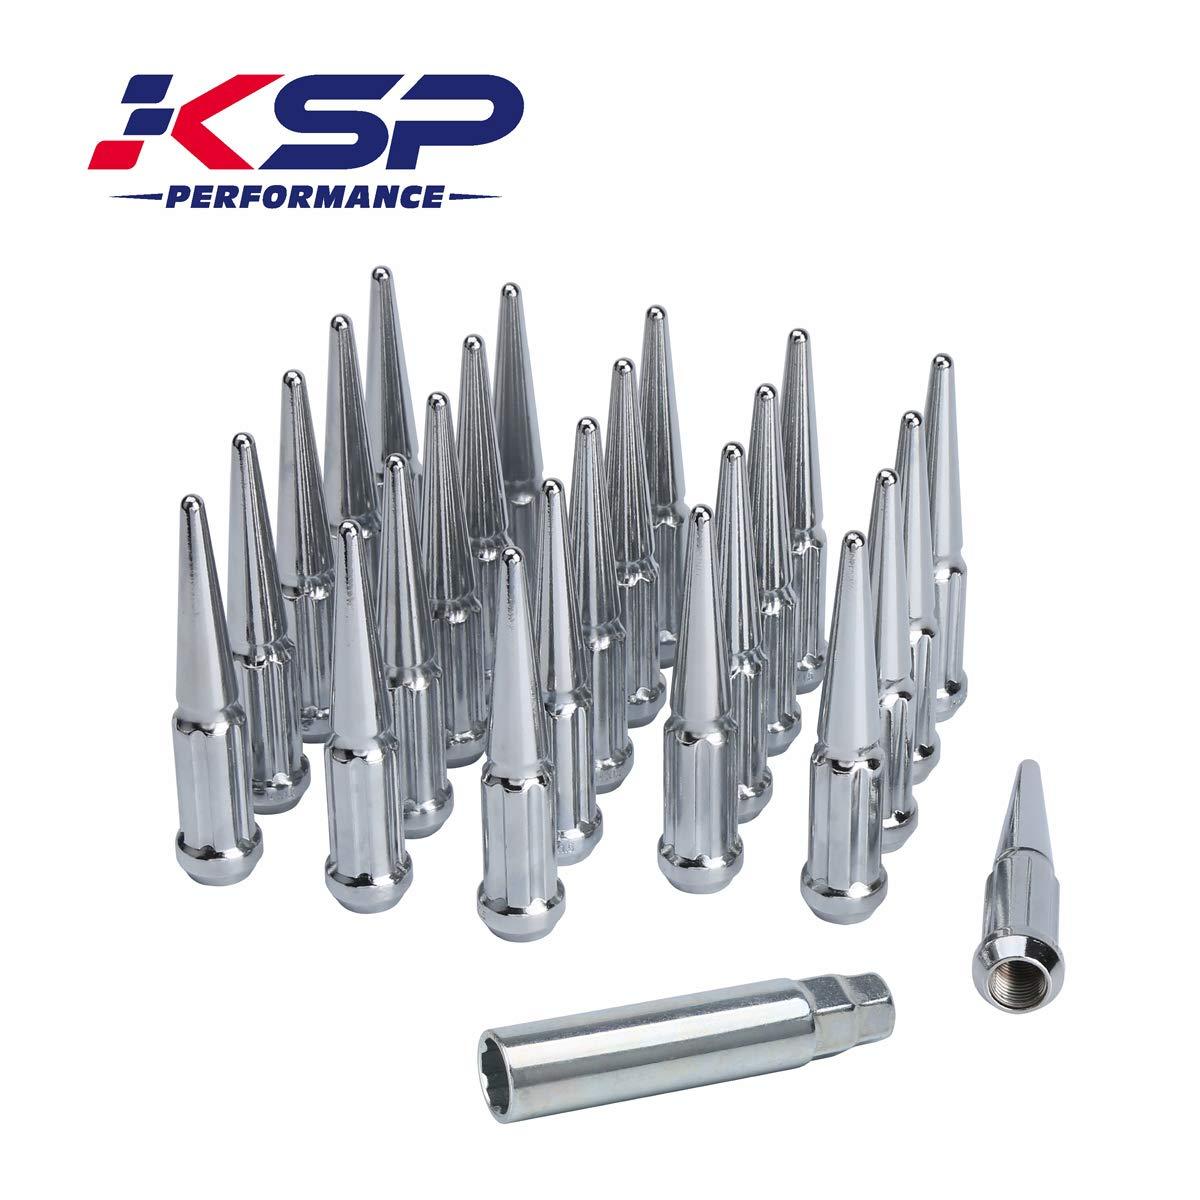 KSP 24 Pc 6 Spline Spike Lug Nuts M14x1.5 Thread 4.4'' Tall Closed End Bulge Acorn Spike Lug Nut and 1 Long Socket Key for Aftermarket Wheels Chrome by KSP Performance